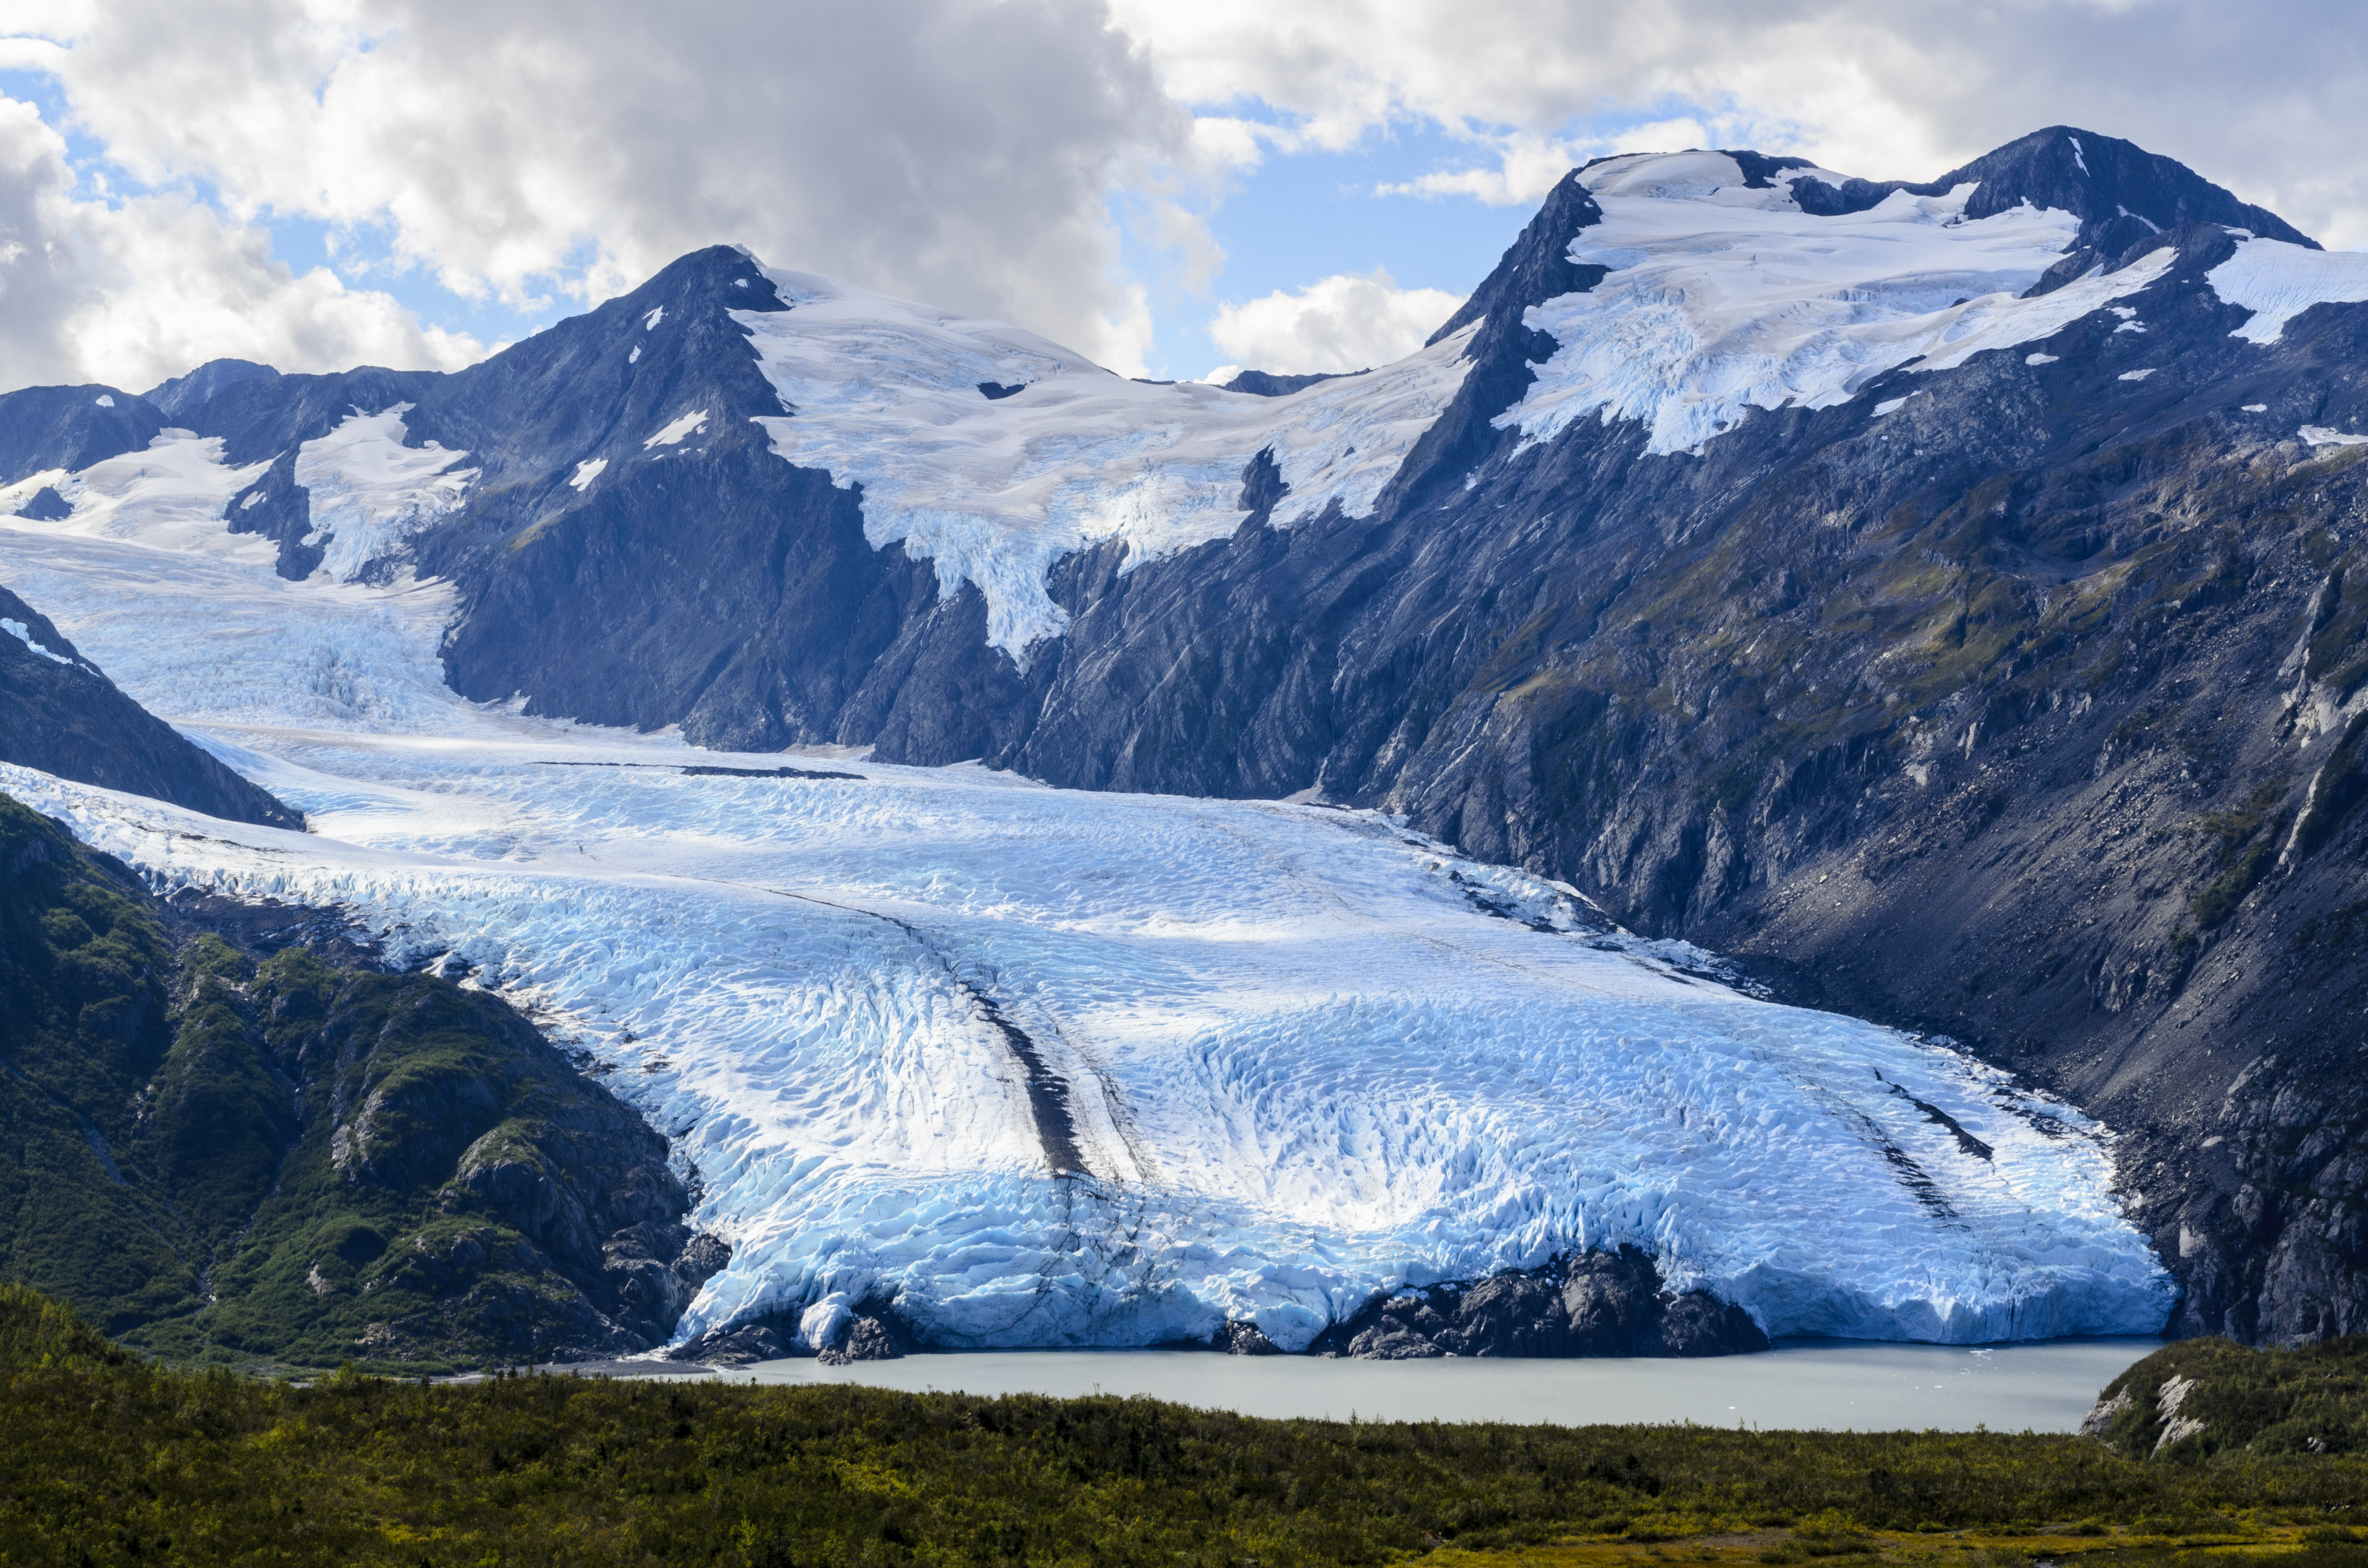 Portage Glacier is part of Chugach National Forest. Shutterstock image via user Susan R. Serna